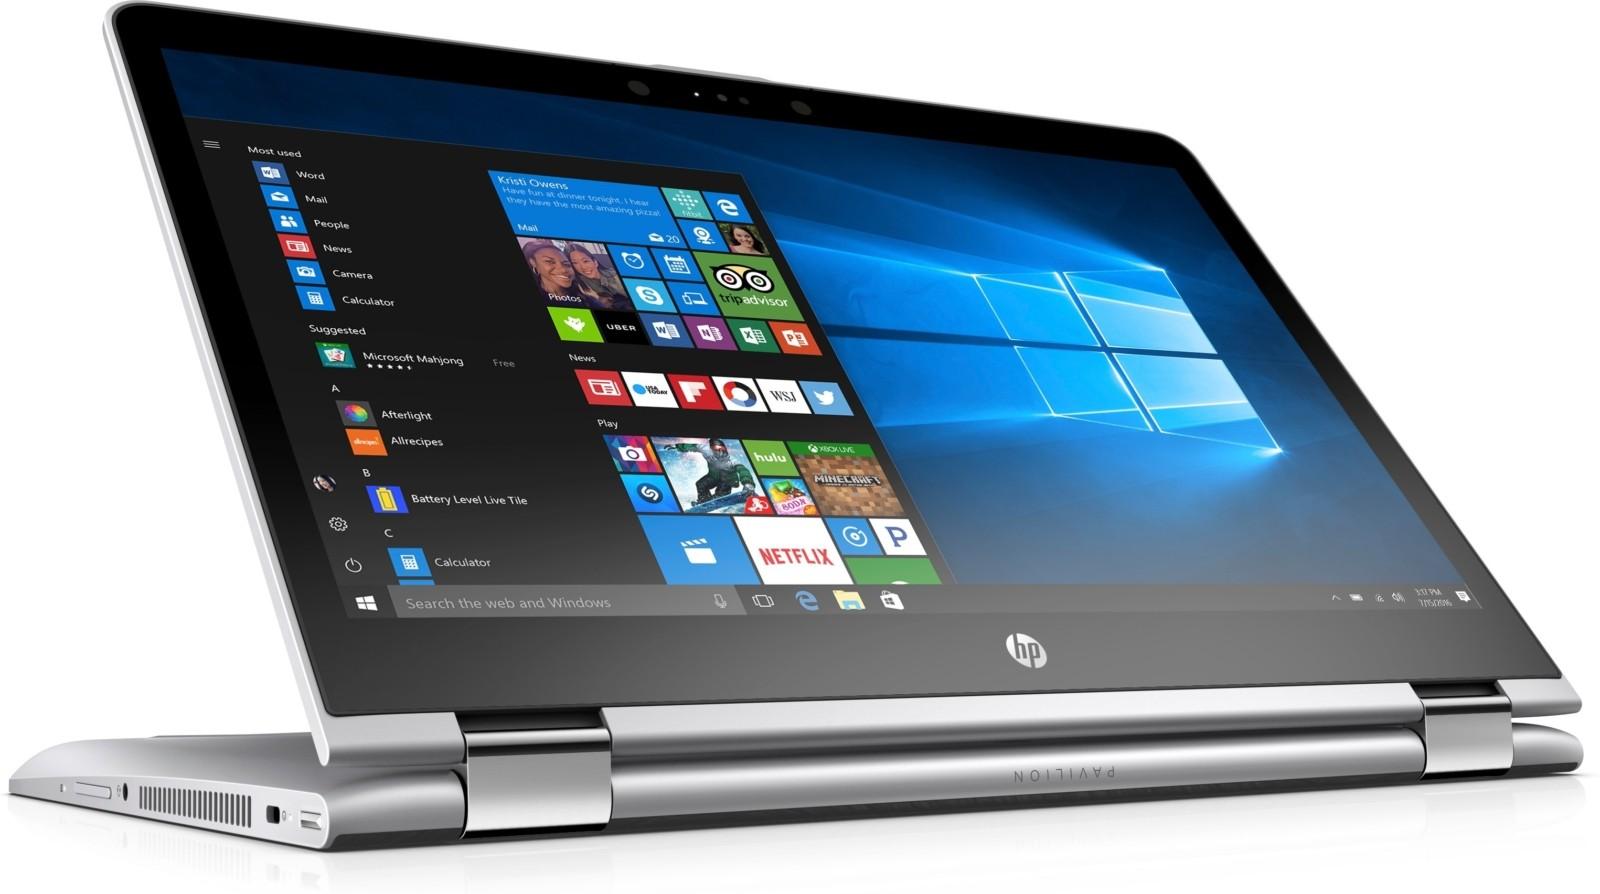 HP Pavilion x360 Convertibile Touchscreen 14-BA030nl